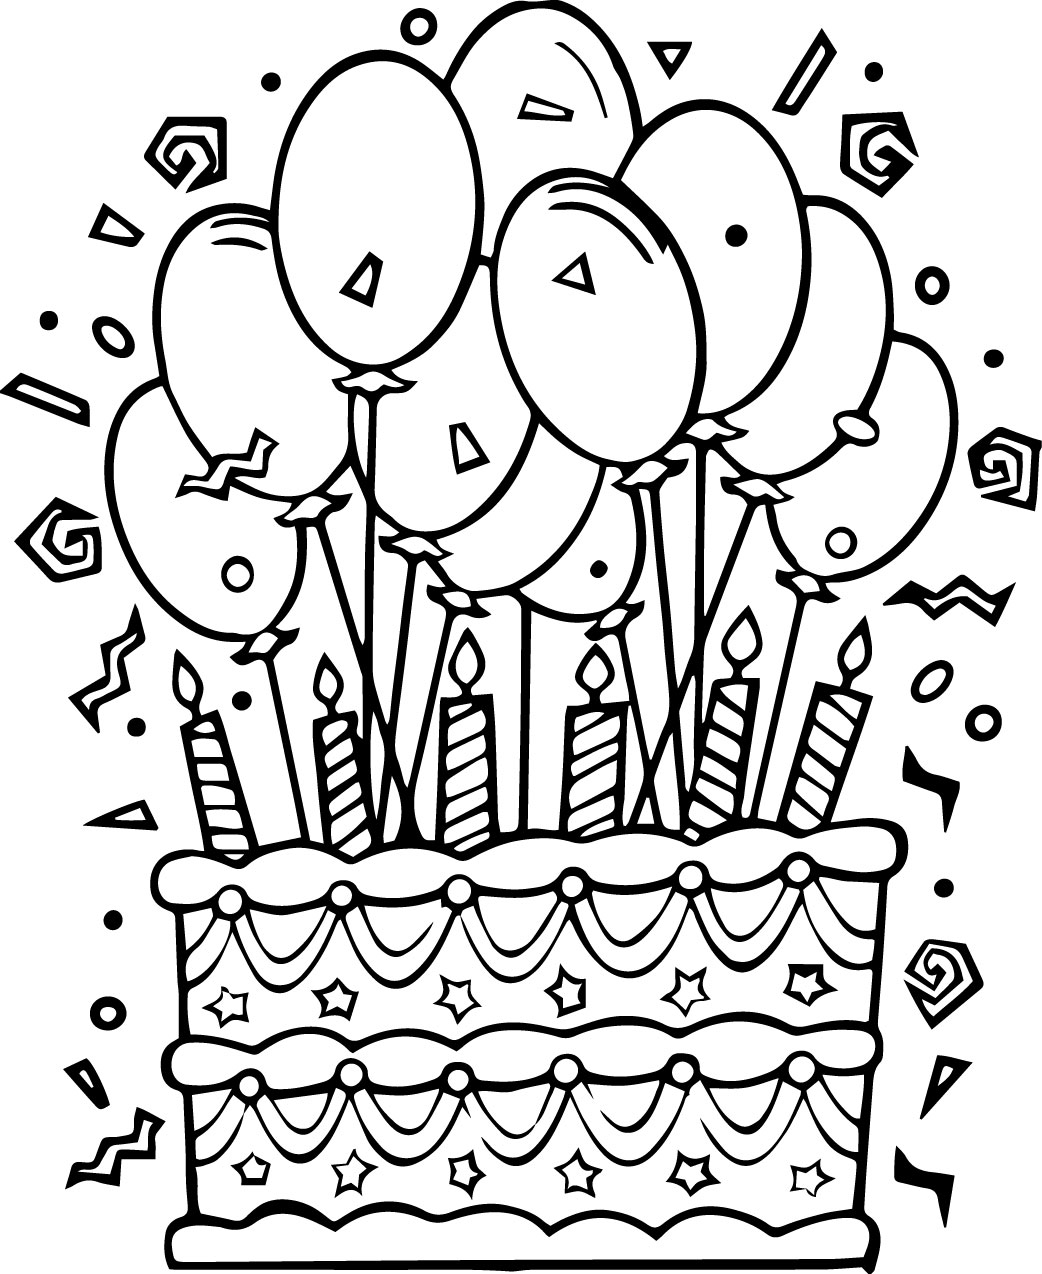 coloring pages birthday cake happy birthday coloring pages cake birthday coloring coloring pages birthday cake